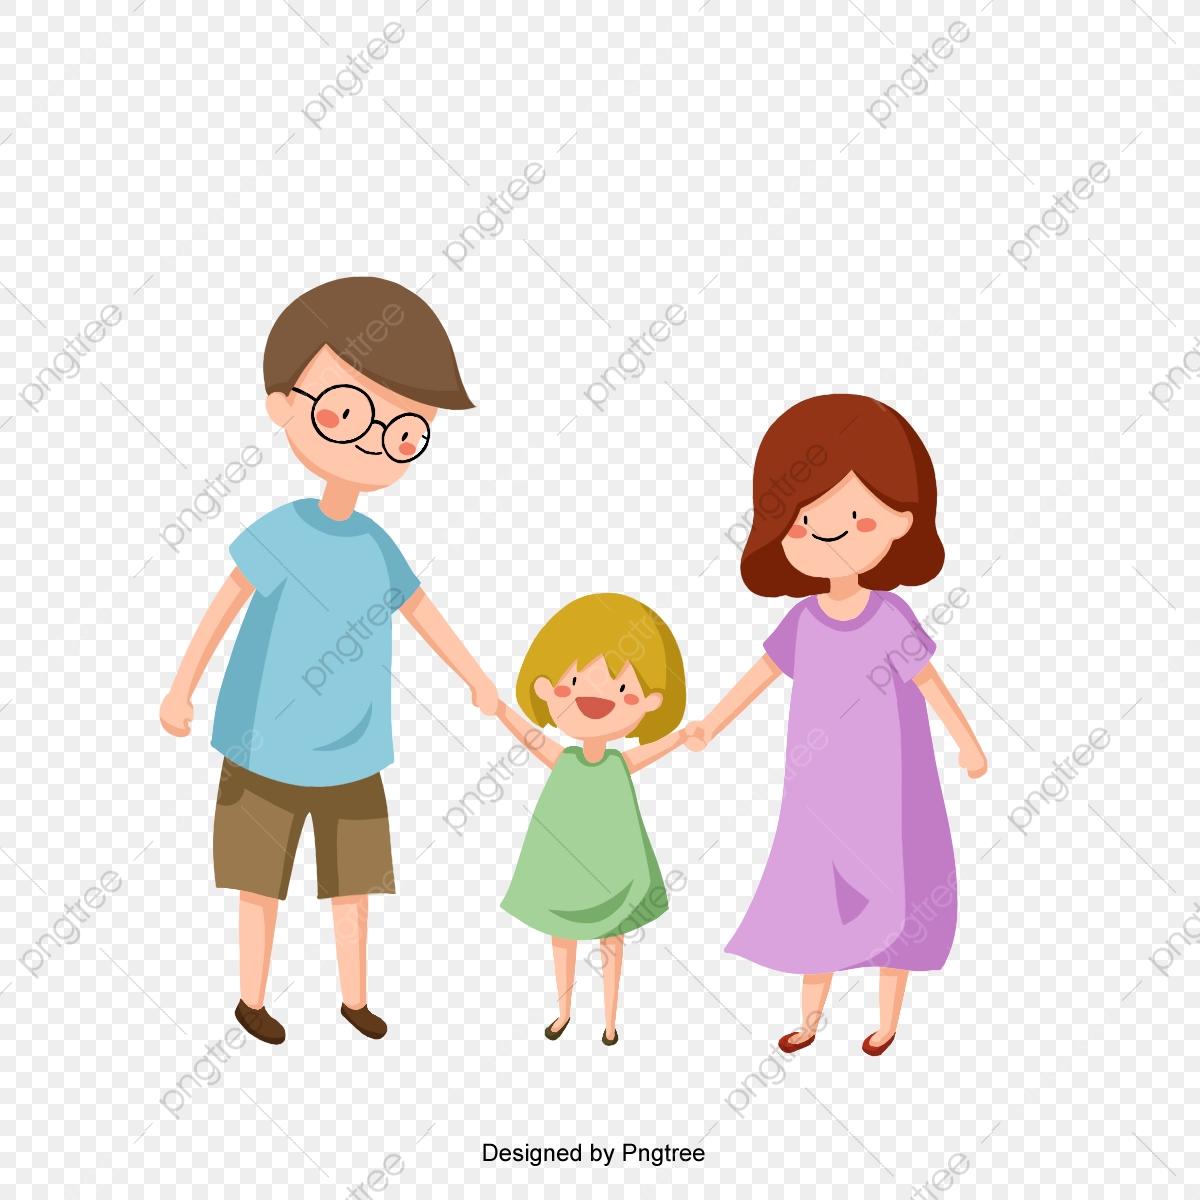 Cartoon Cute Family Hand In Hand, Cartoon, Cute, Lovely PNG.